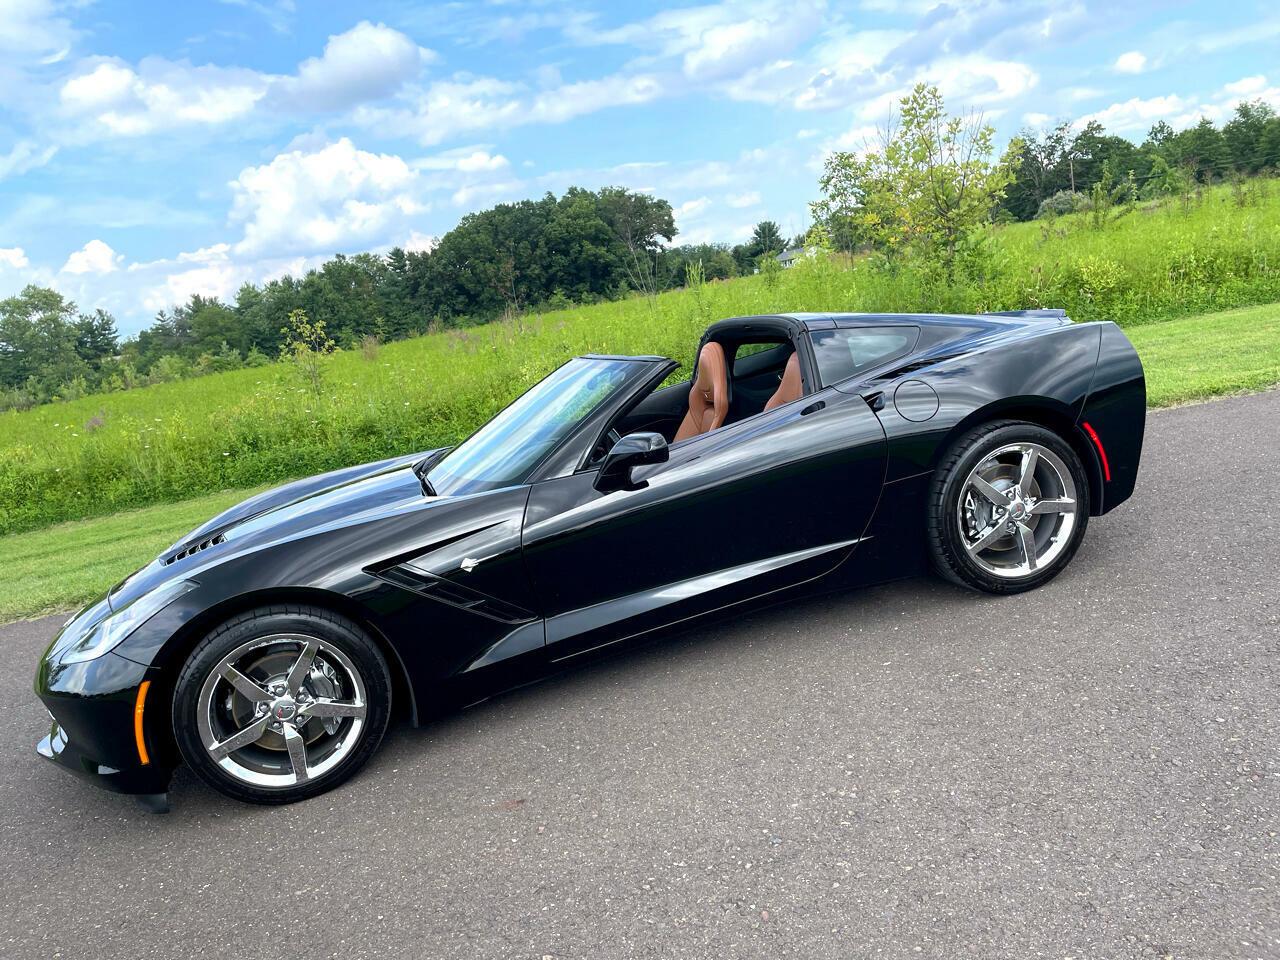 2014 Black Chevrolet Corvette Coupe 3LT | C7 Corvette Photo 5